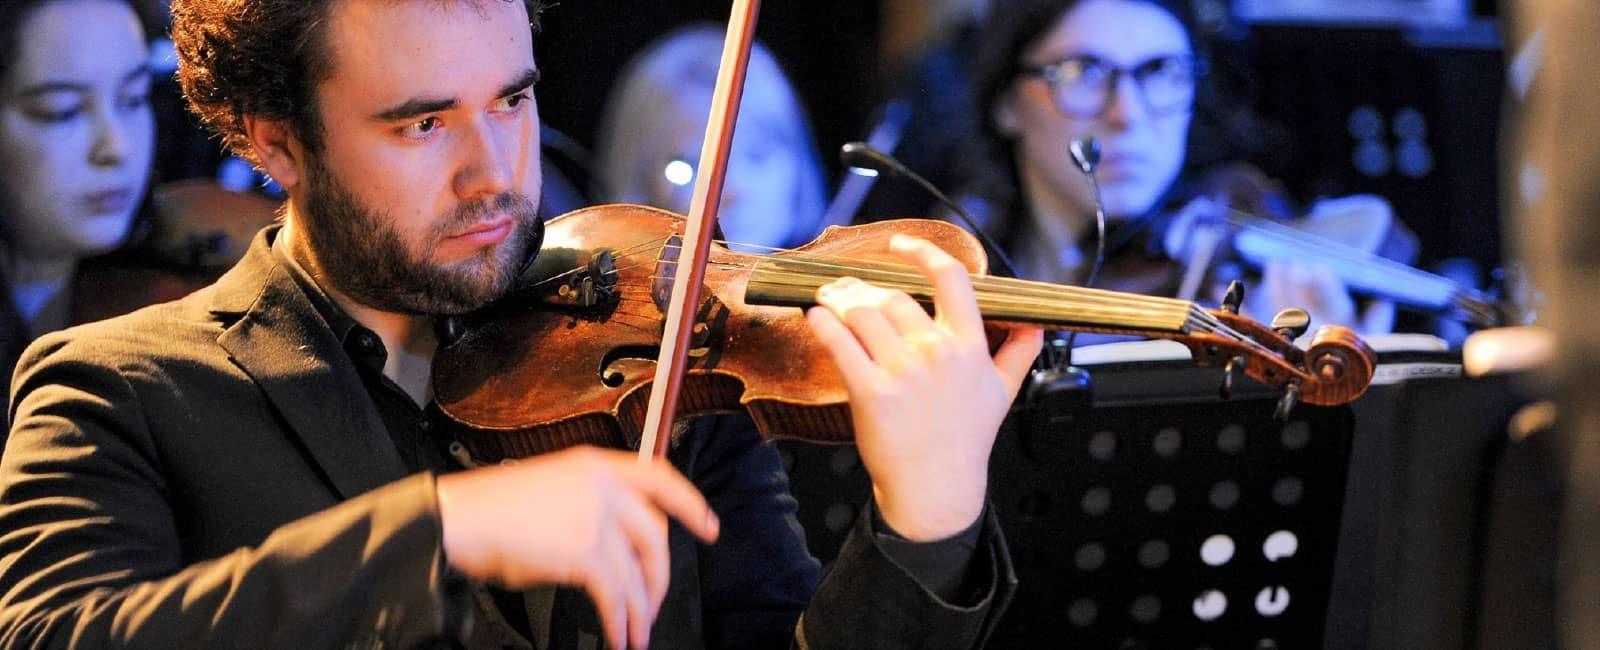 Ben Spiers - Violinst